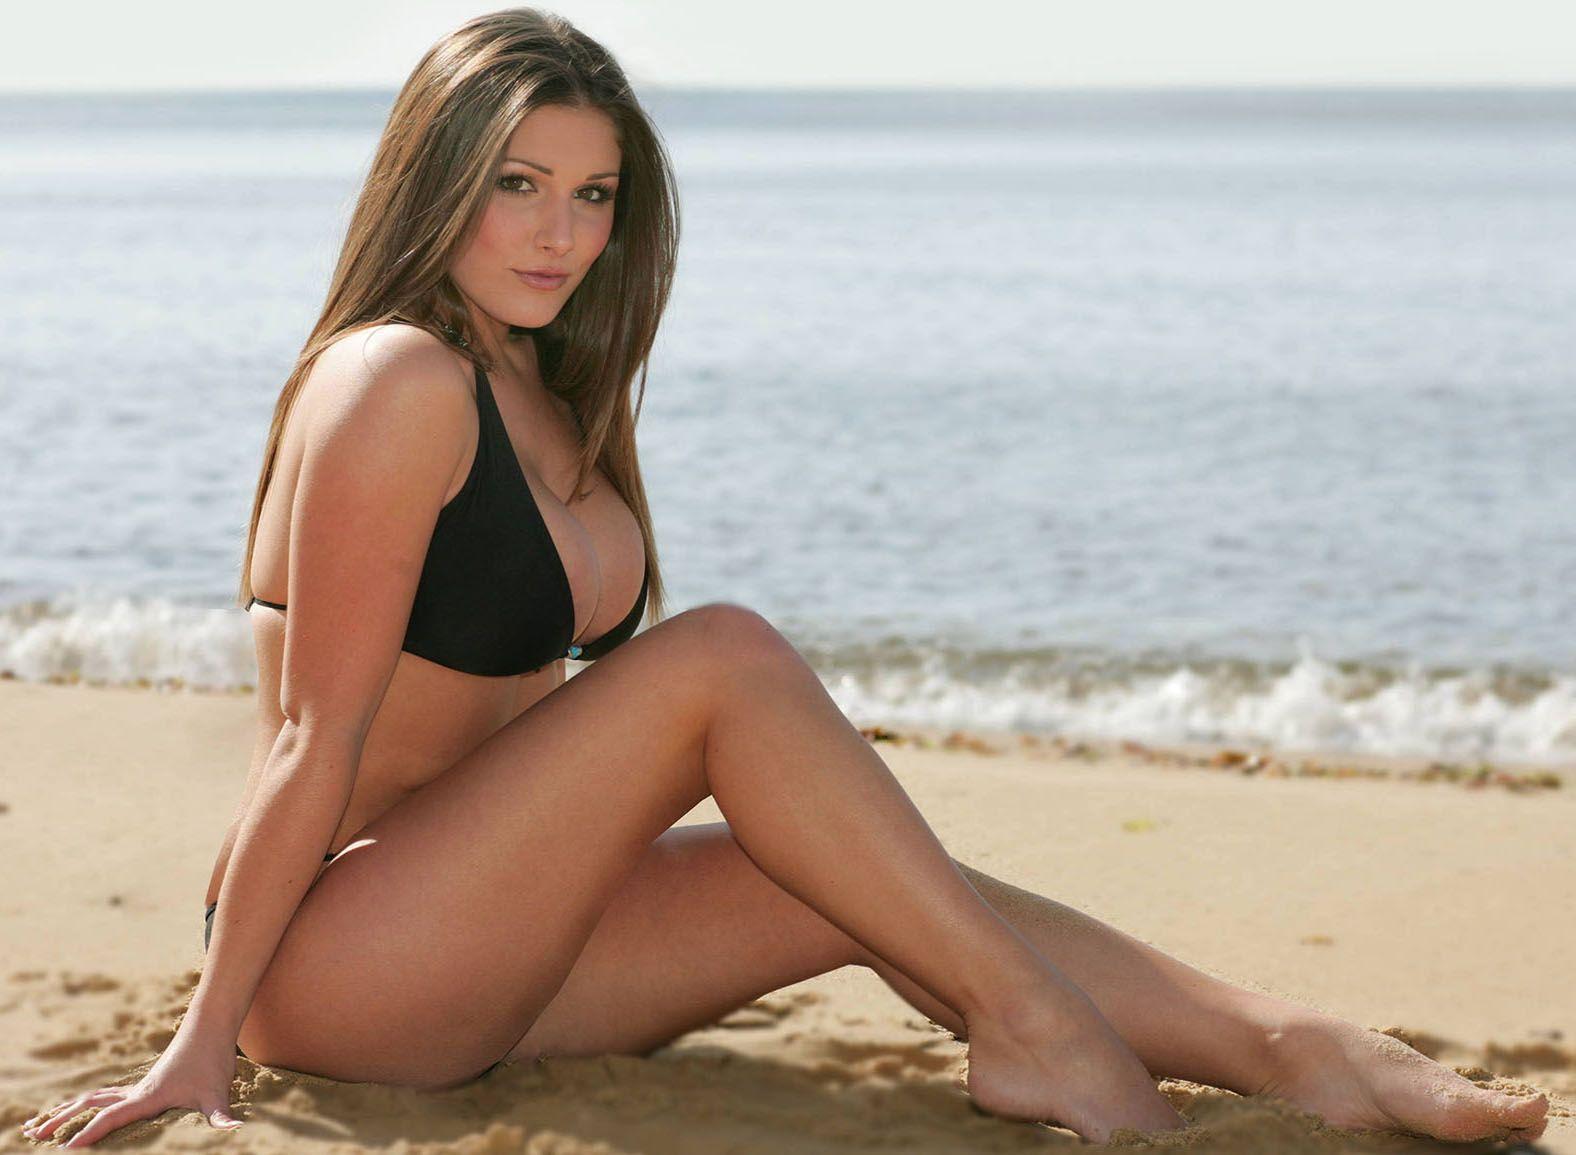 glamour-beach-babe-galleries